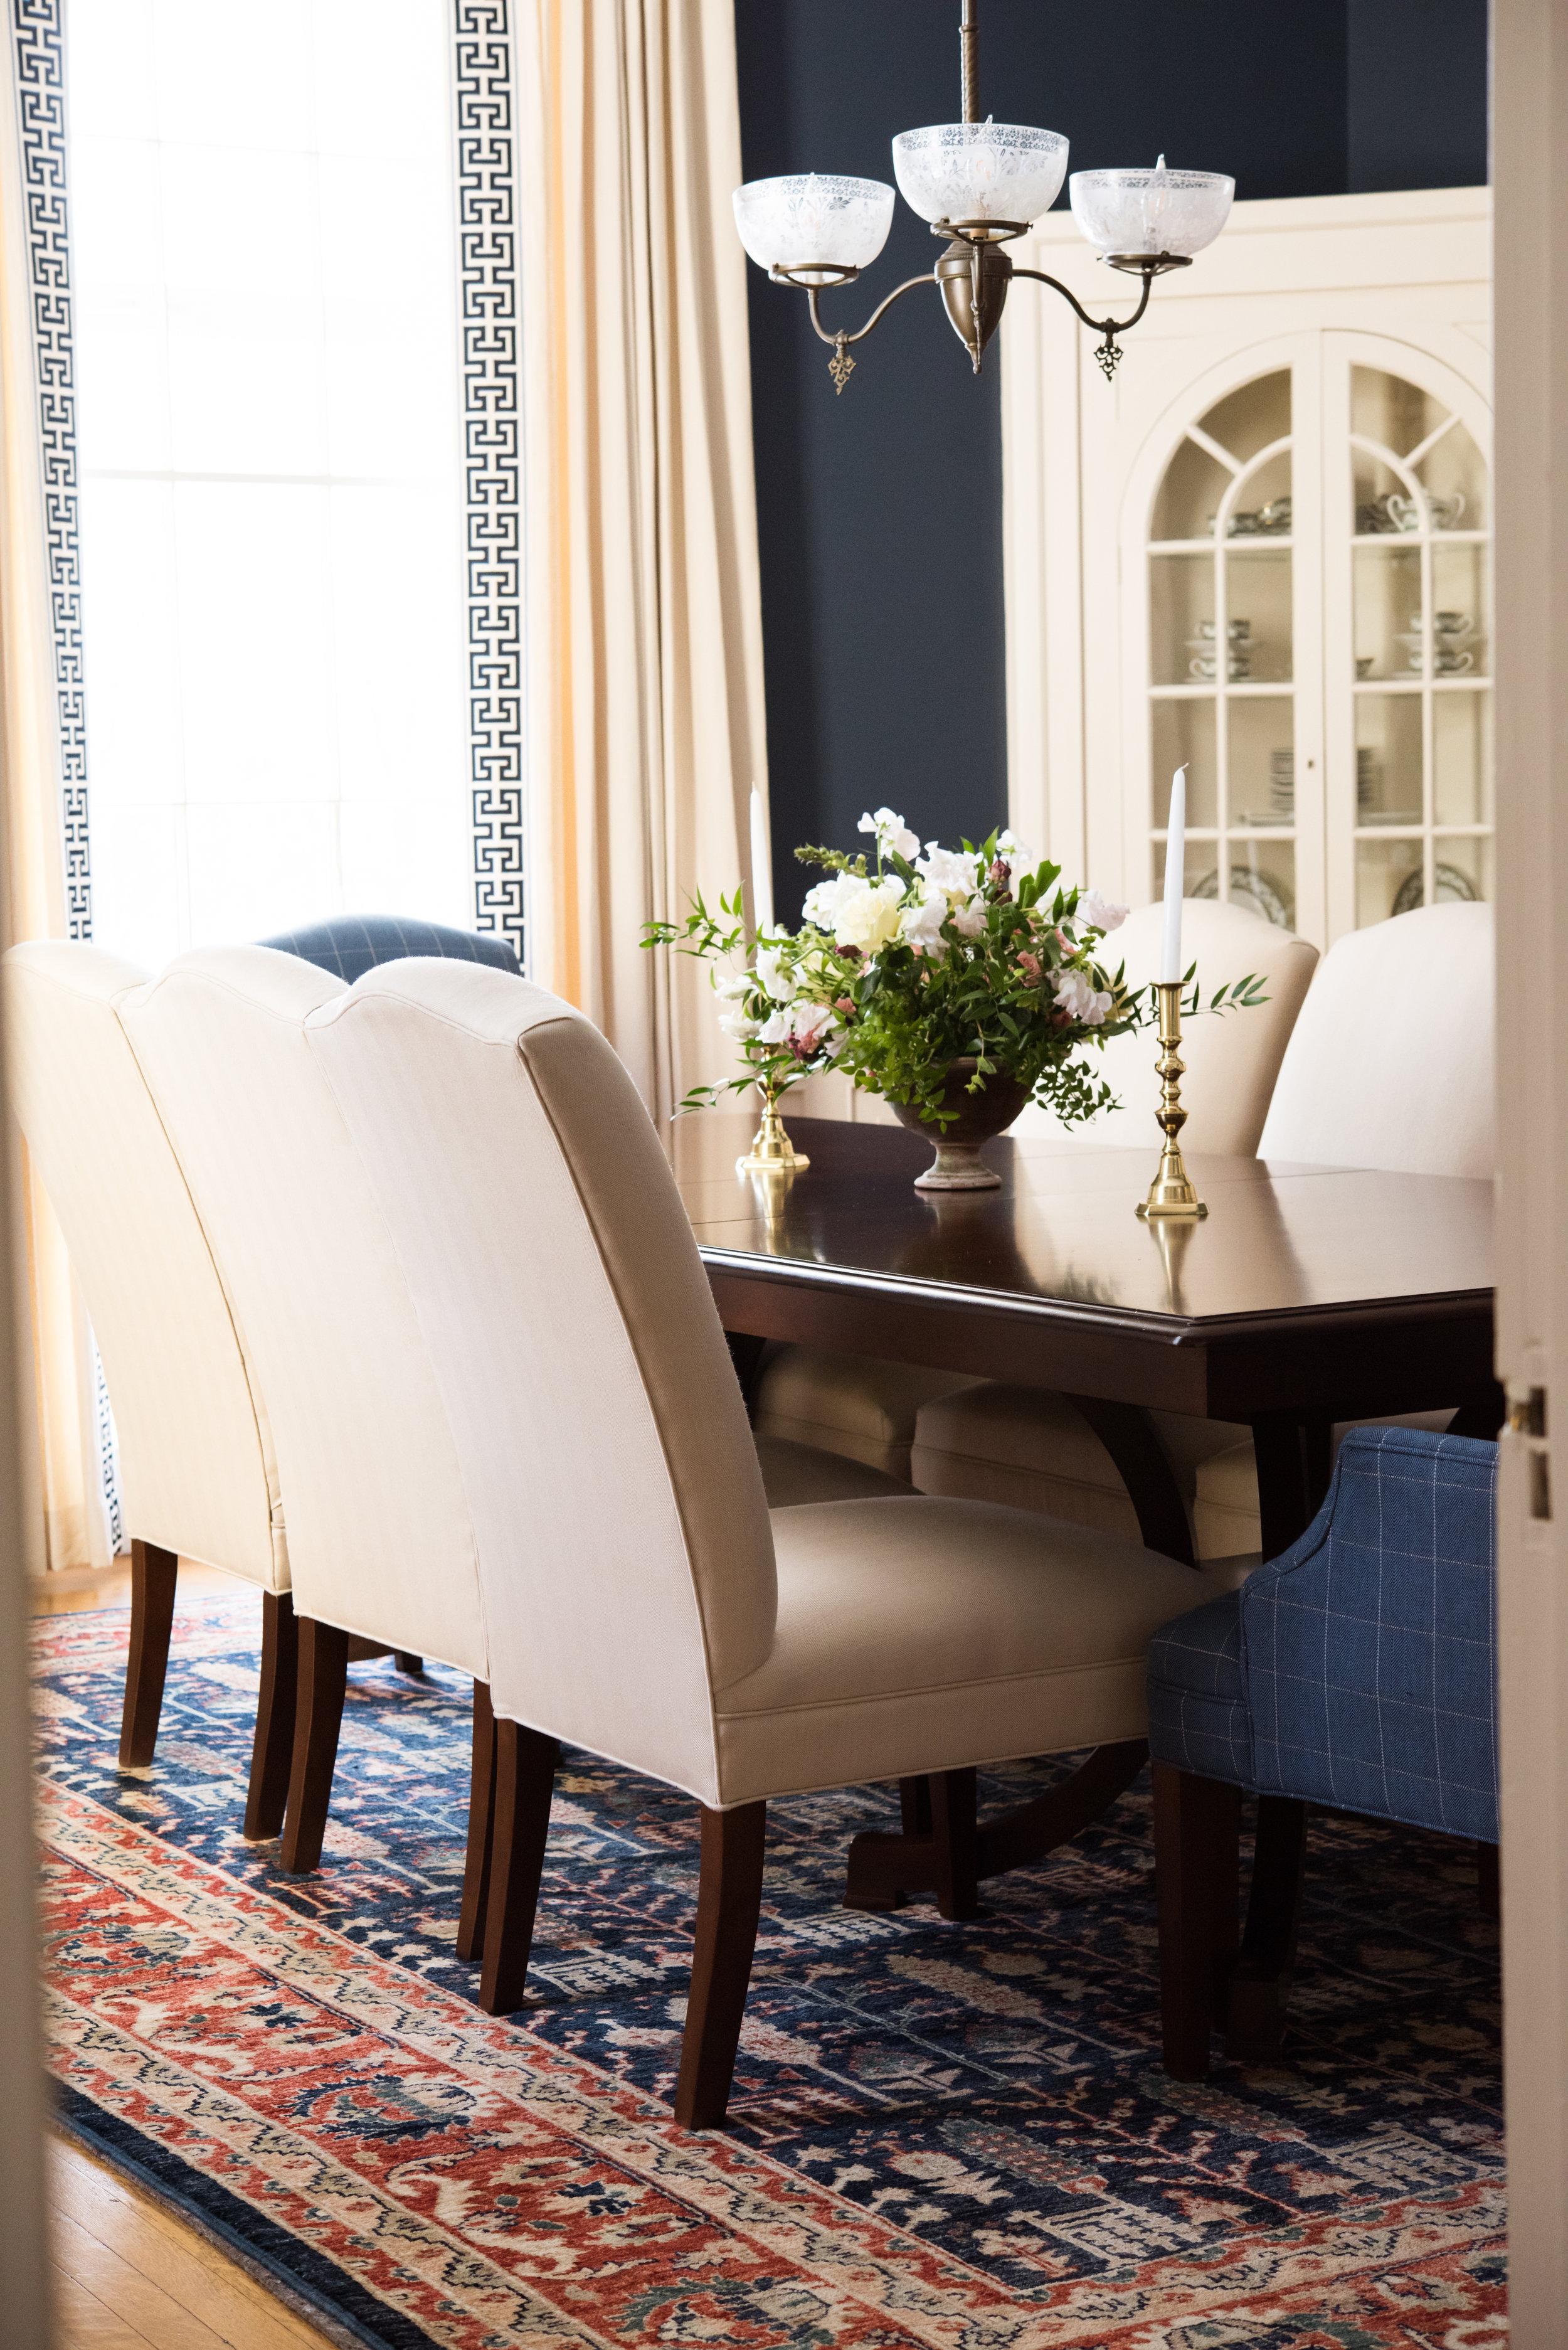 formal-blue-dining-room-teaselwood-design-0077.jpg